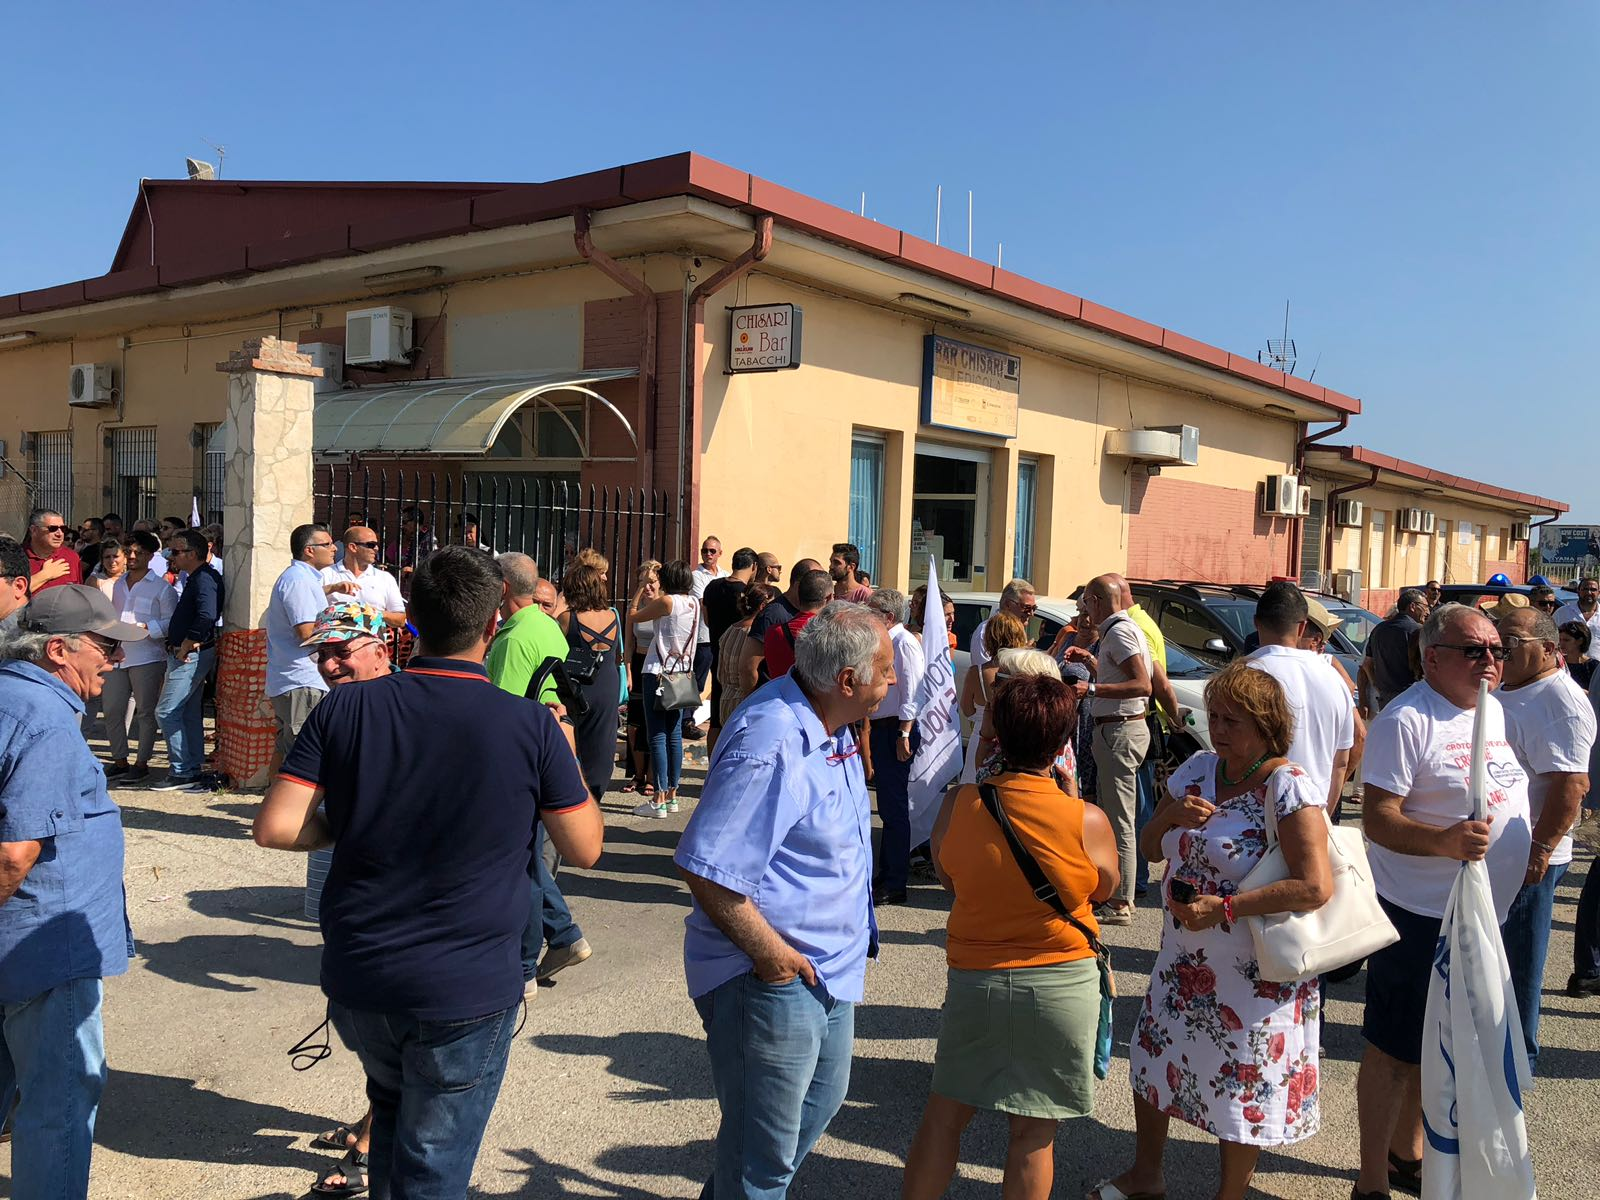 Aeroporto Pisa : Navetta da pisa aeroporto empoli binari dintorni